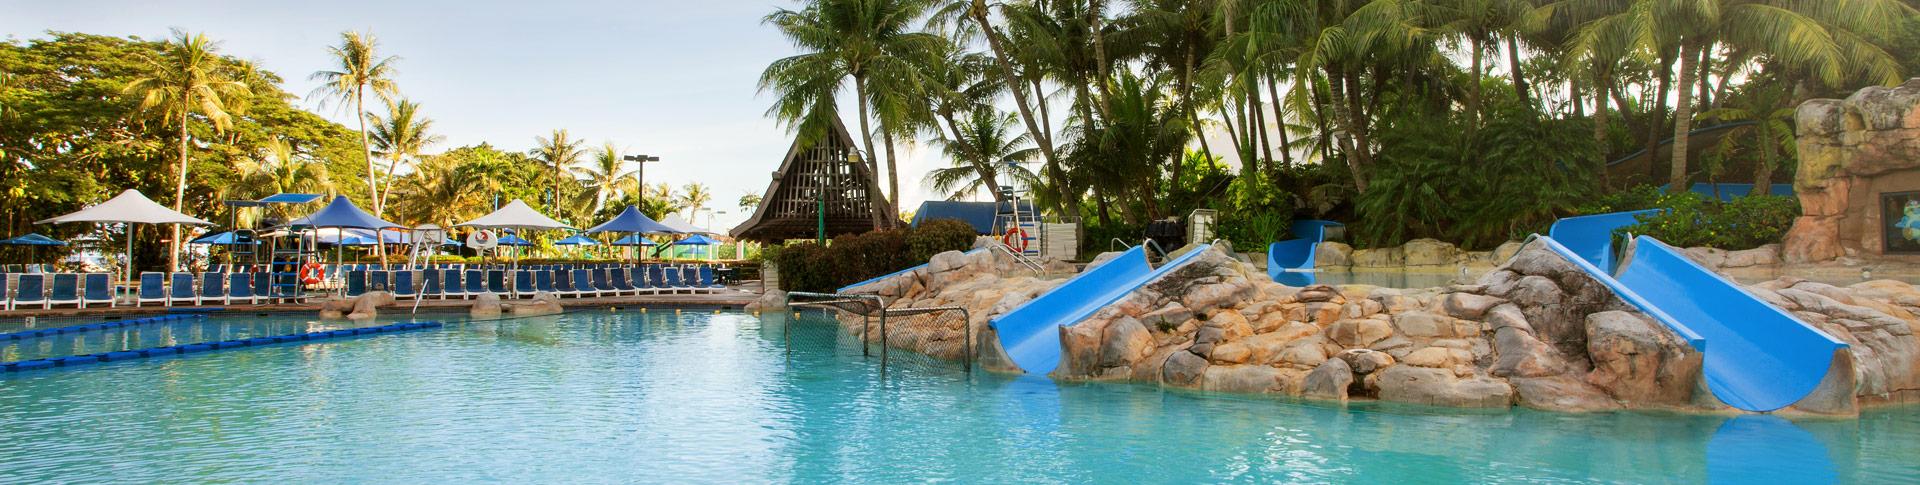 pool at Pacific Islands Club Guam, Tumon